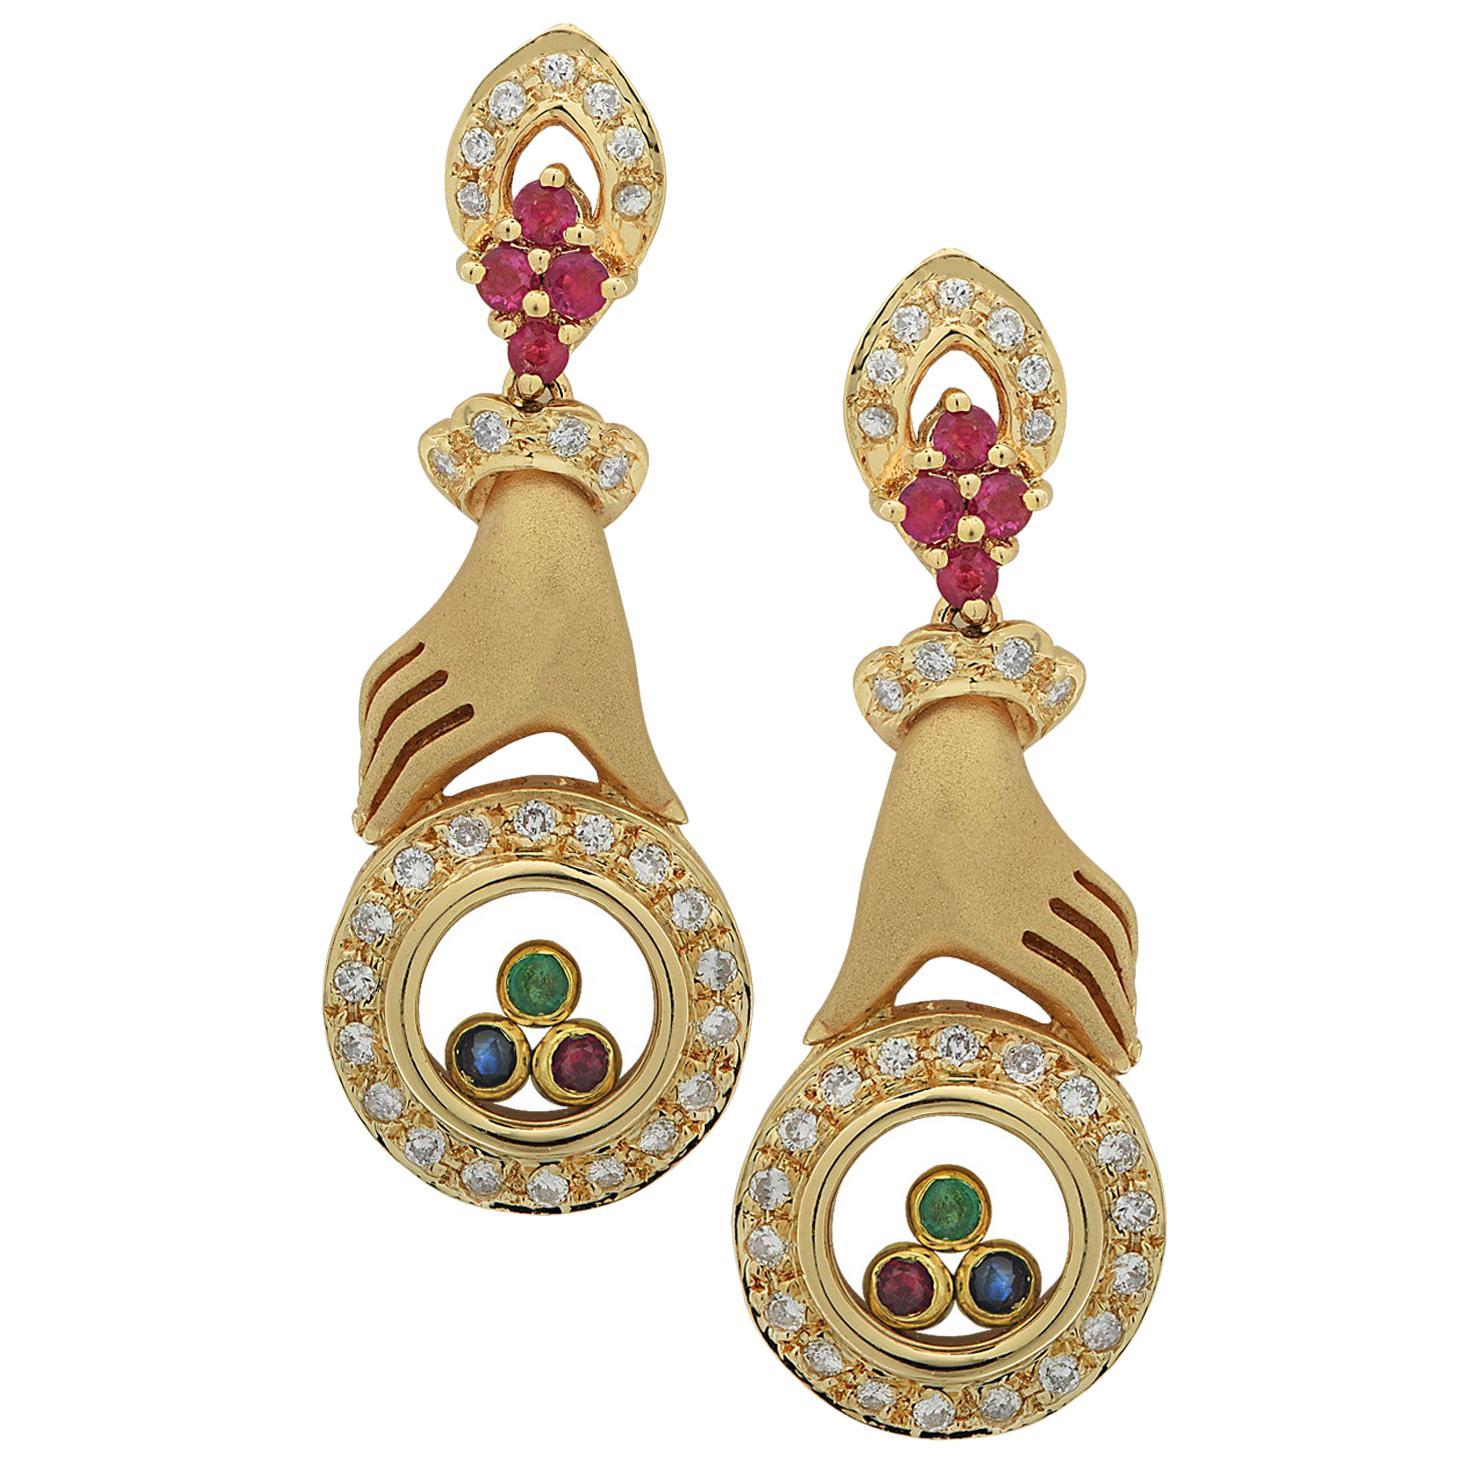 Diamond, Ruby, Sapphire and Emerald Earrings